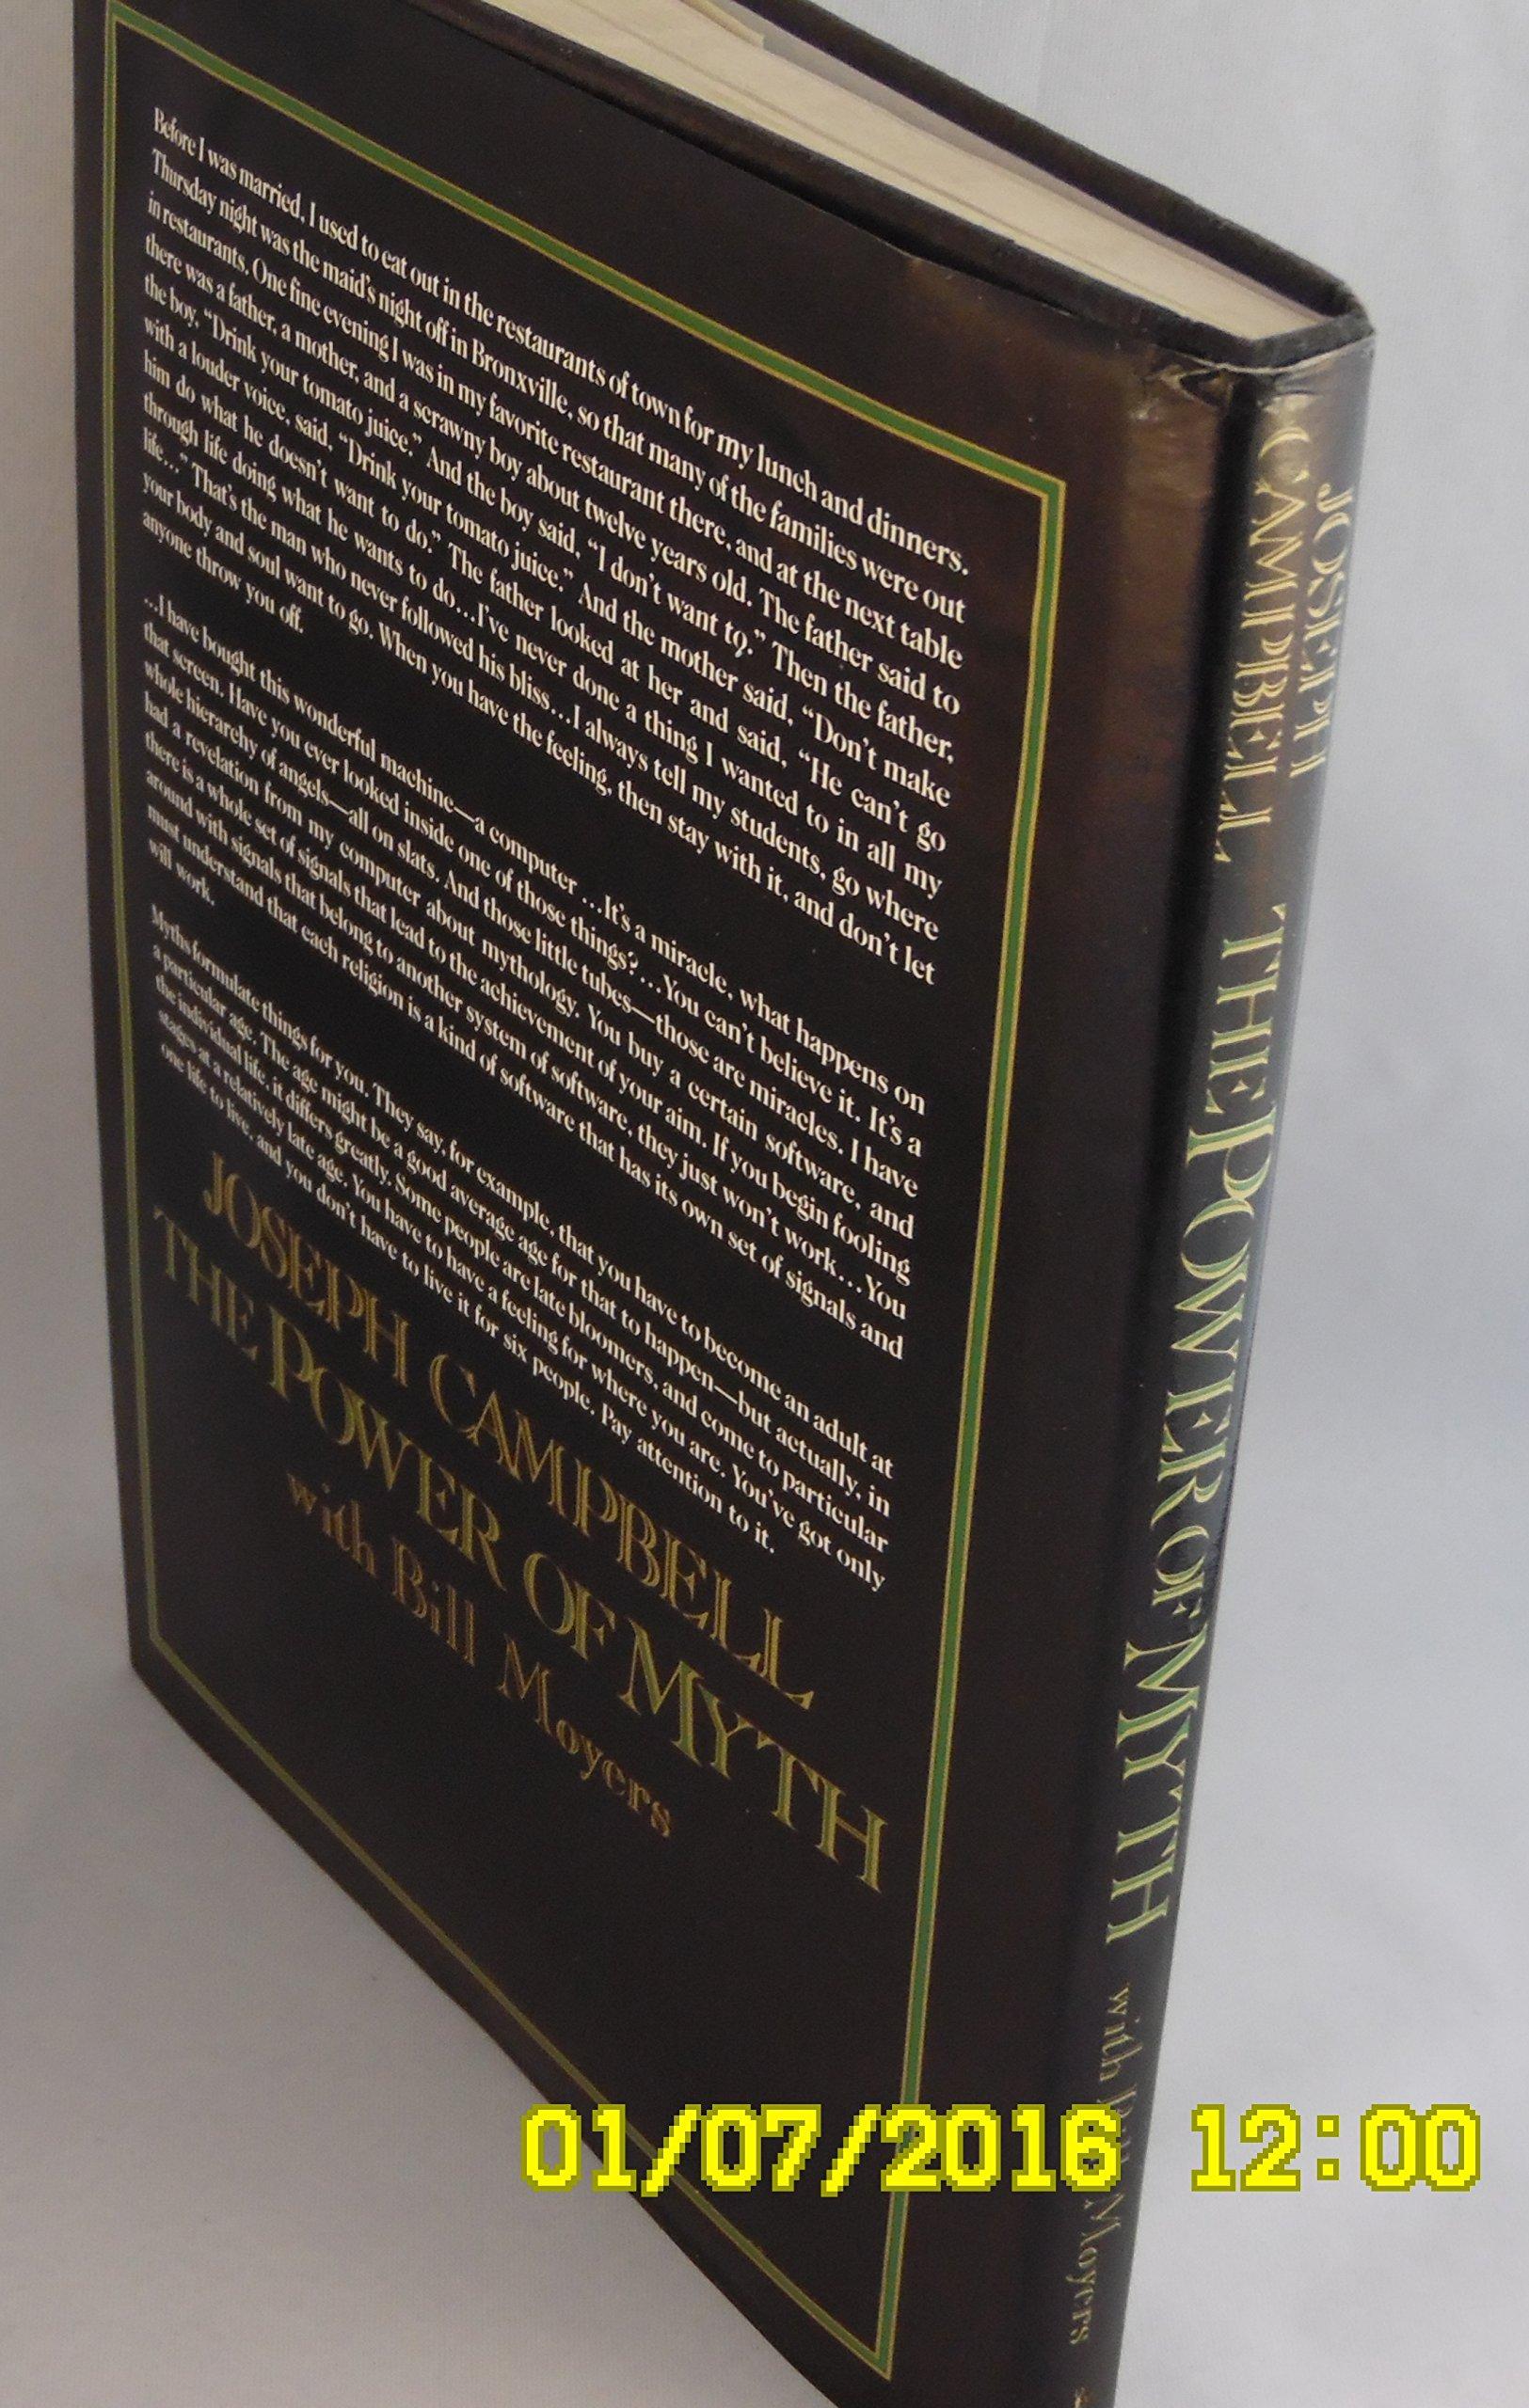 The Power of Myth: Amazon.es: Joseph Campbell, Bill D. Moyers: Libros en idiomas extranjeros